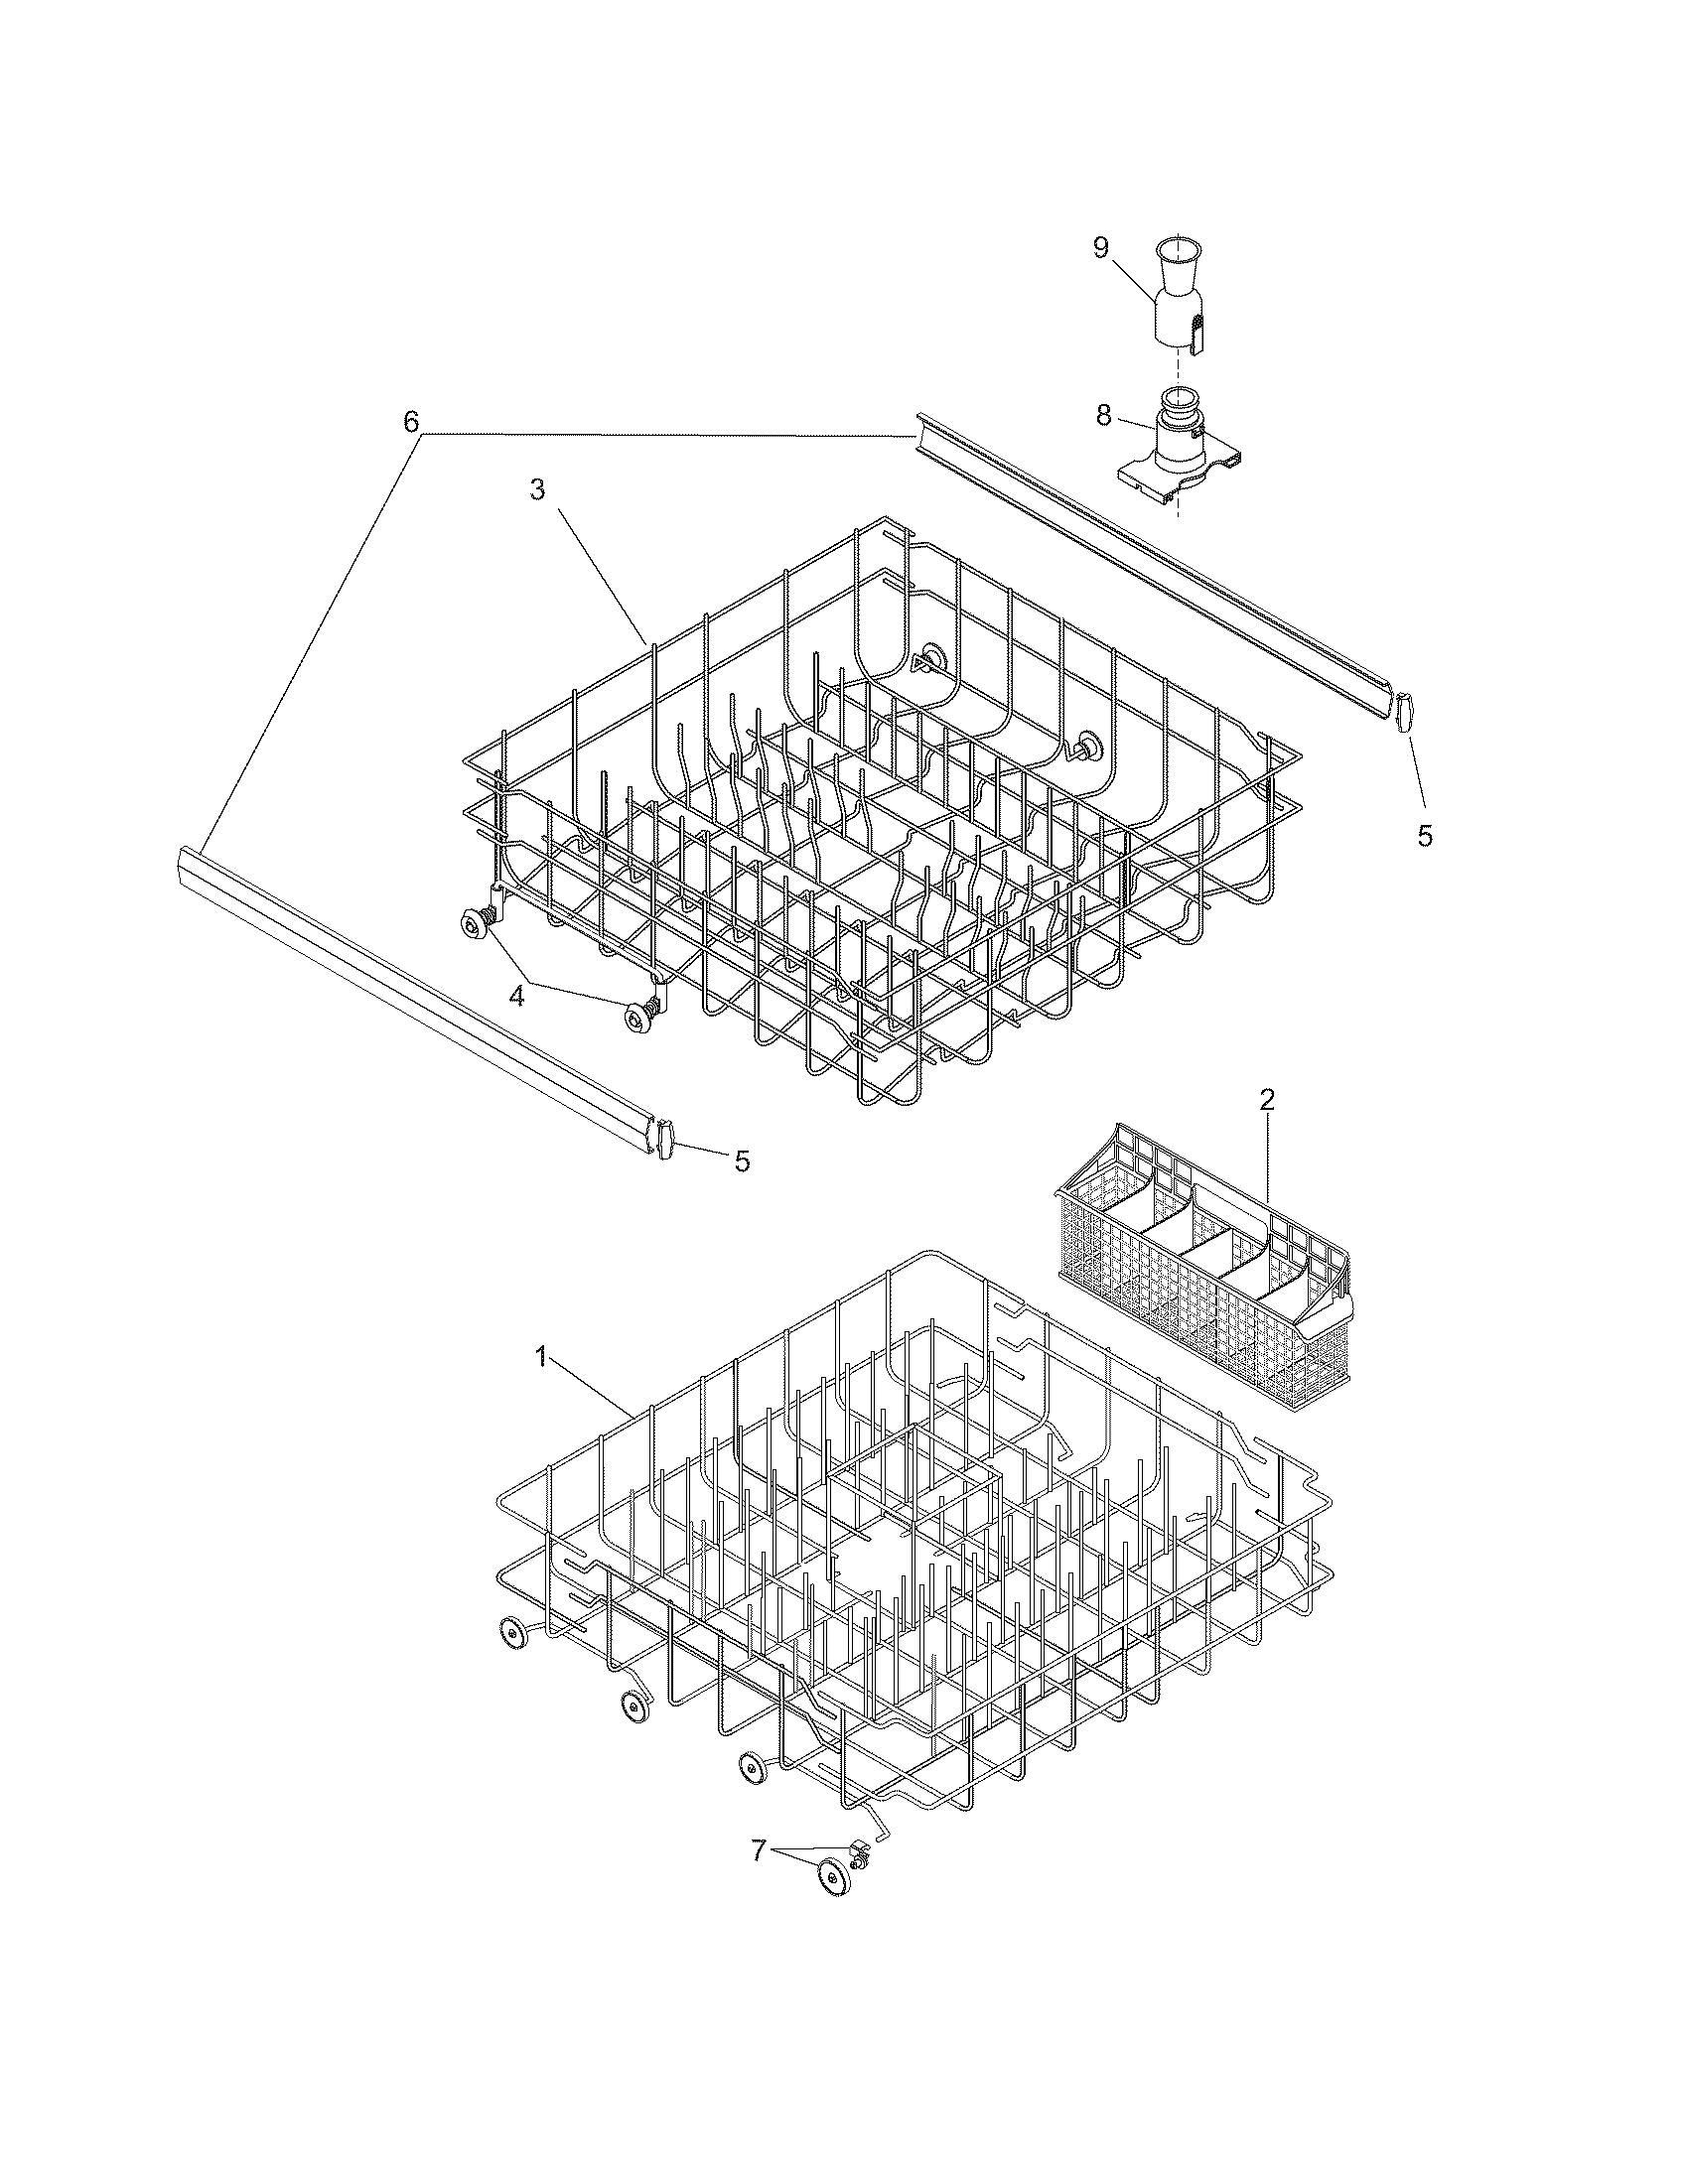 Frigidaire dishwasher manual model fdb510lcs3